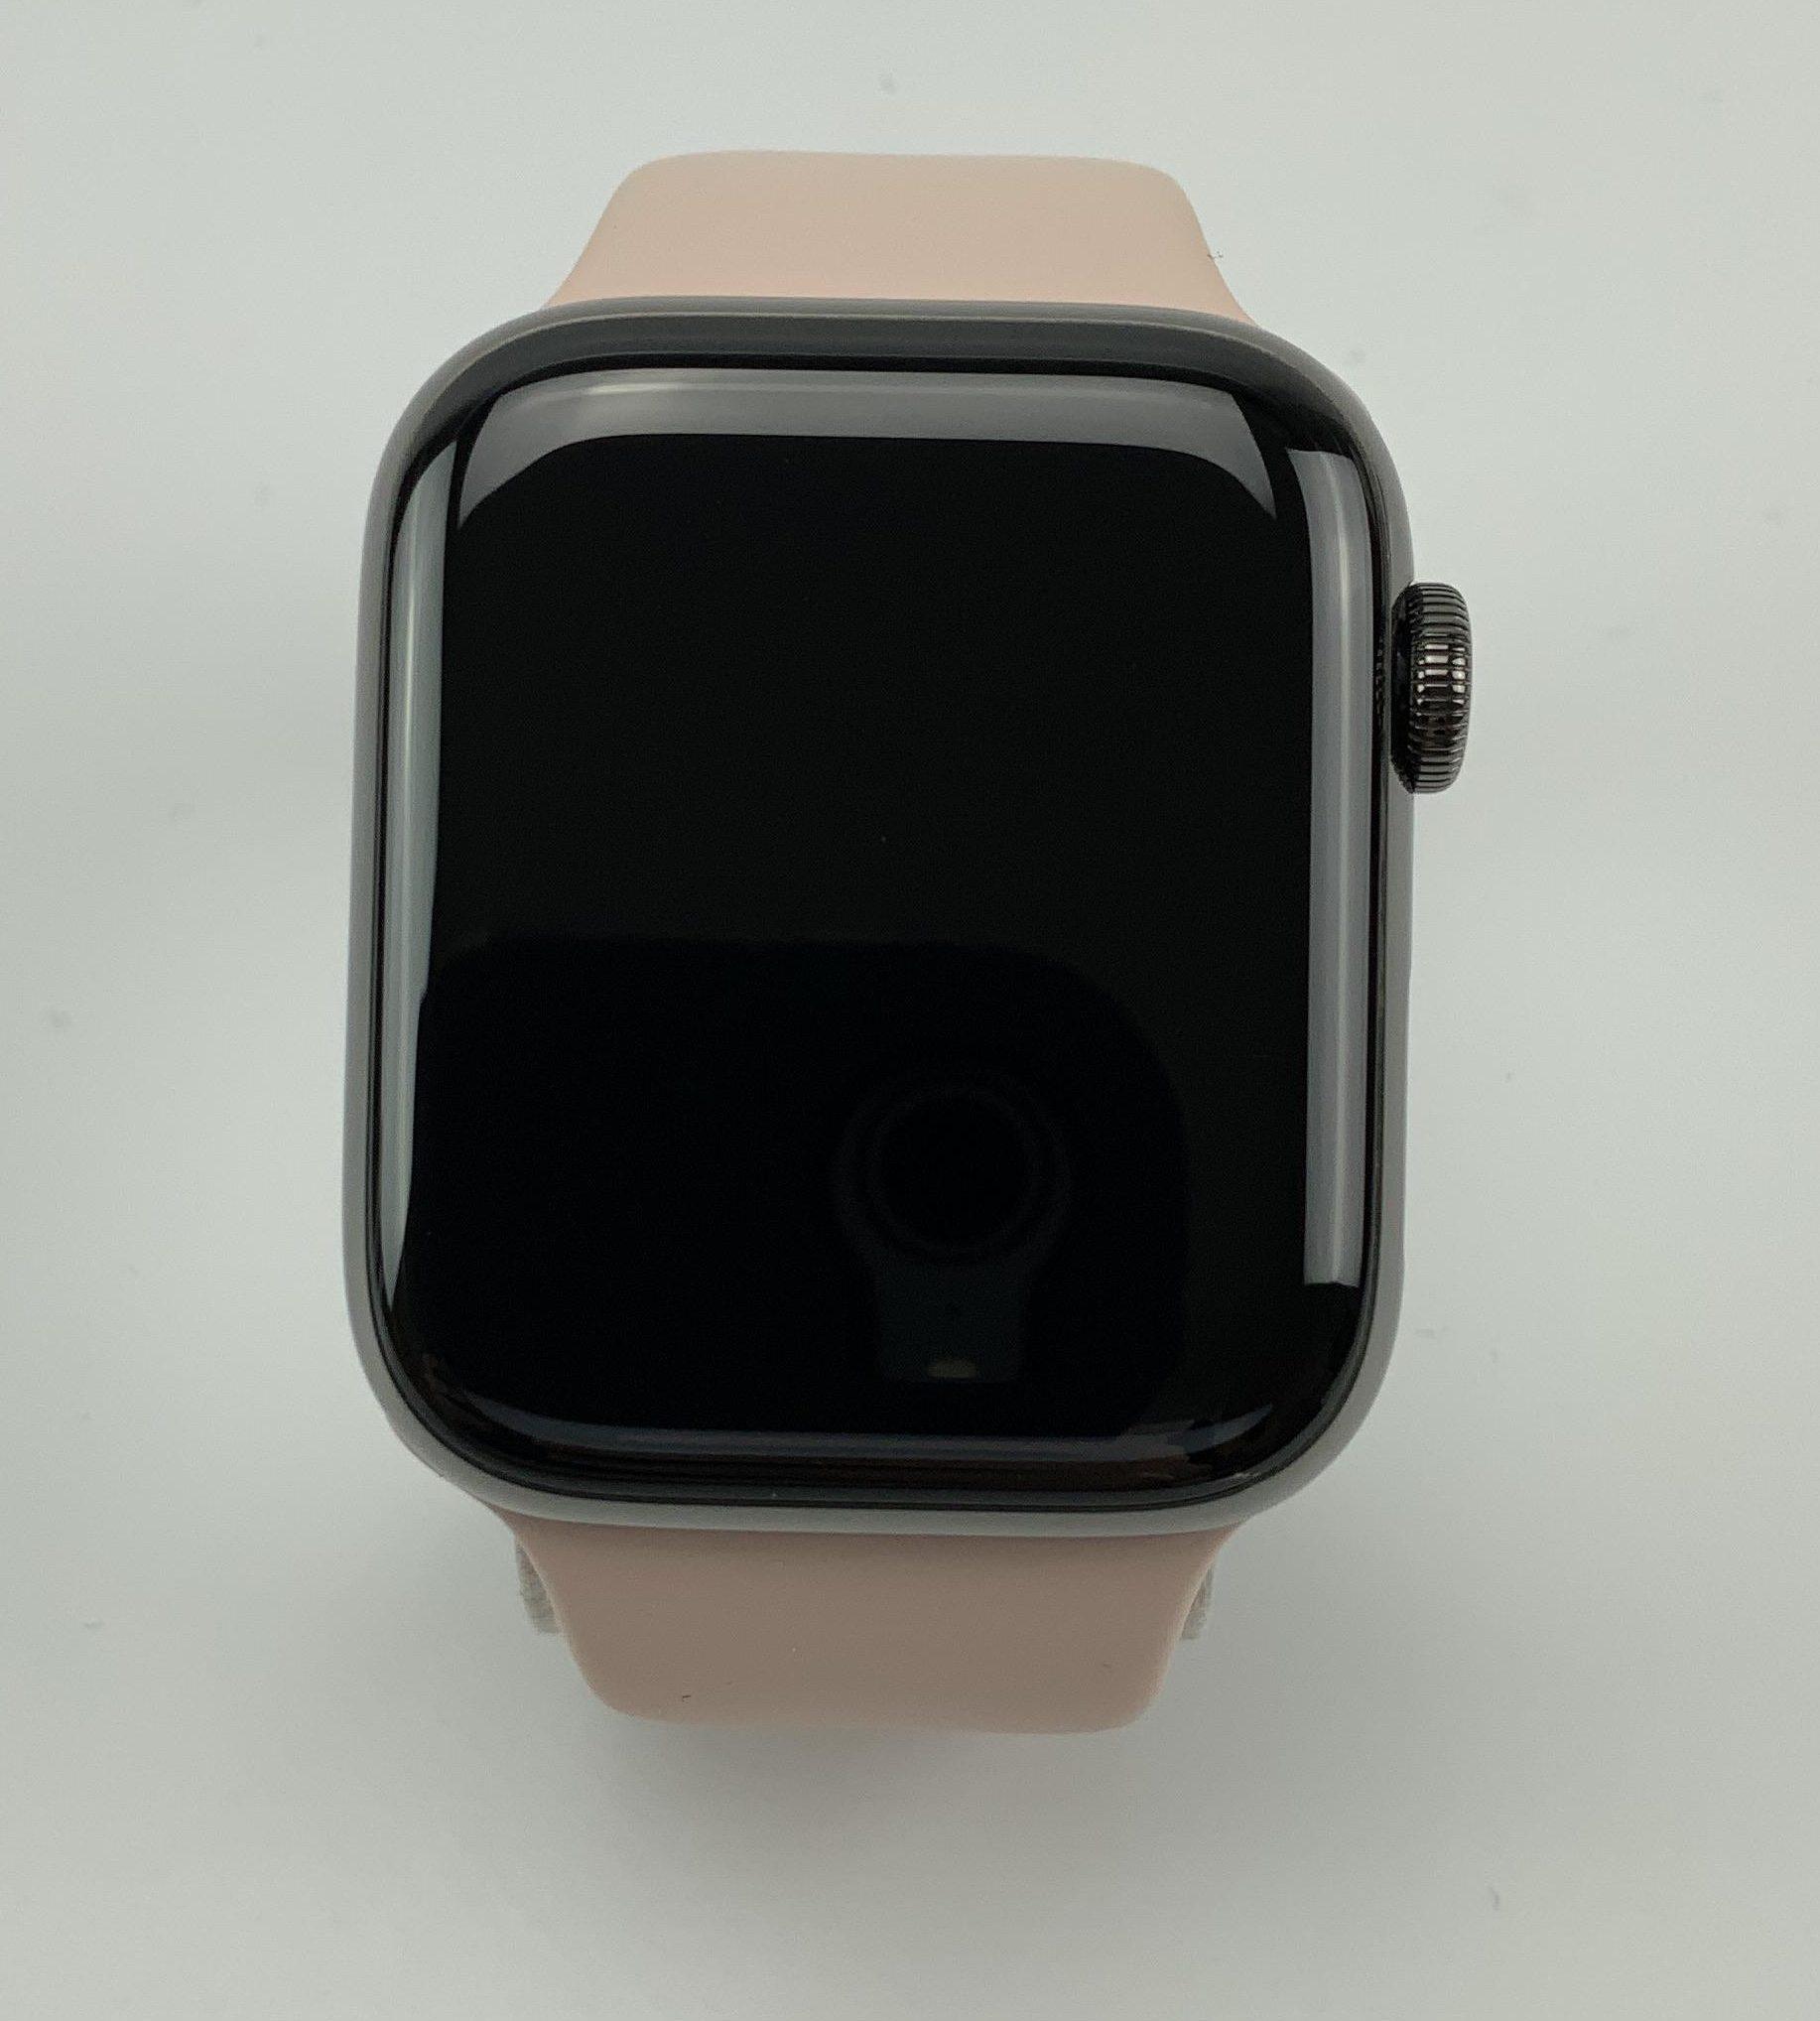 Watch Series 6 Steel Cellular (44mm), Graphite, image 1